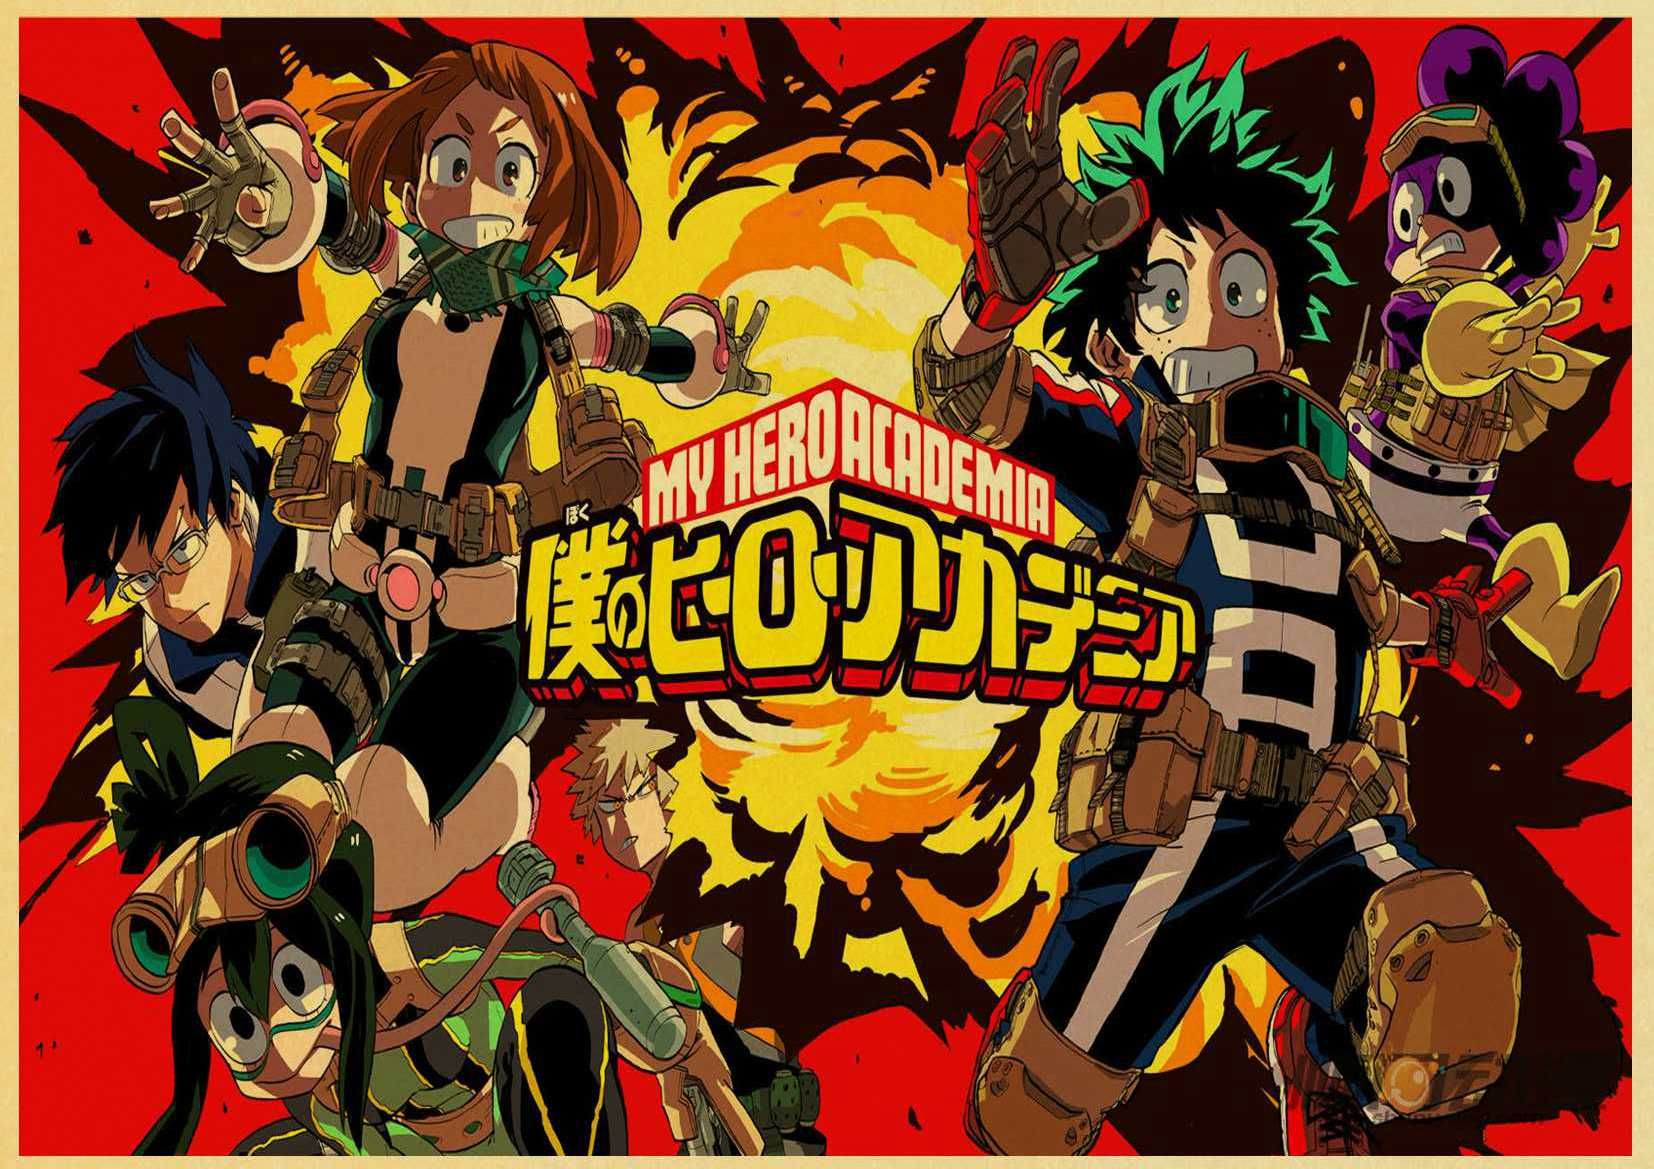 Sick, My Hero Academia Retro poster Free Shipping